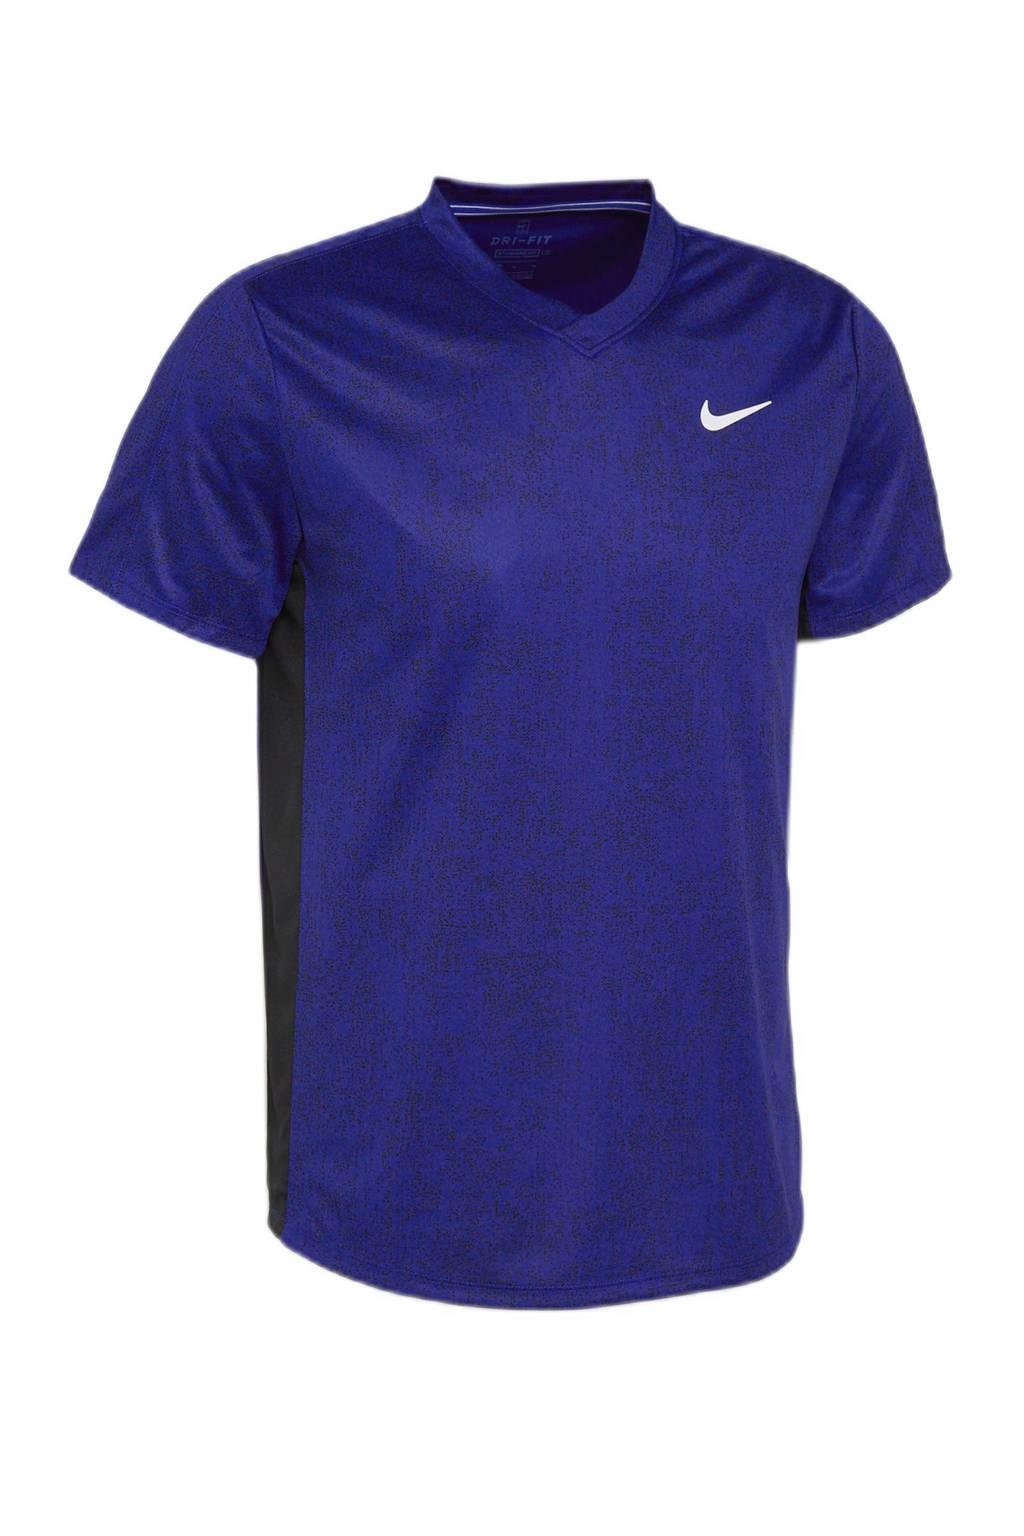 Nike   sport T-shirt blauw/zwart, Blauw/zwart